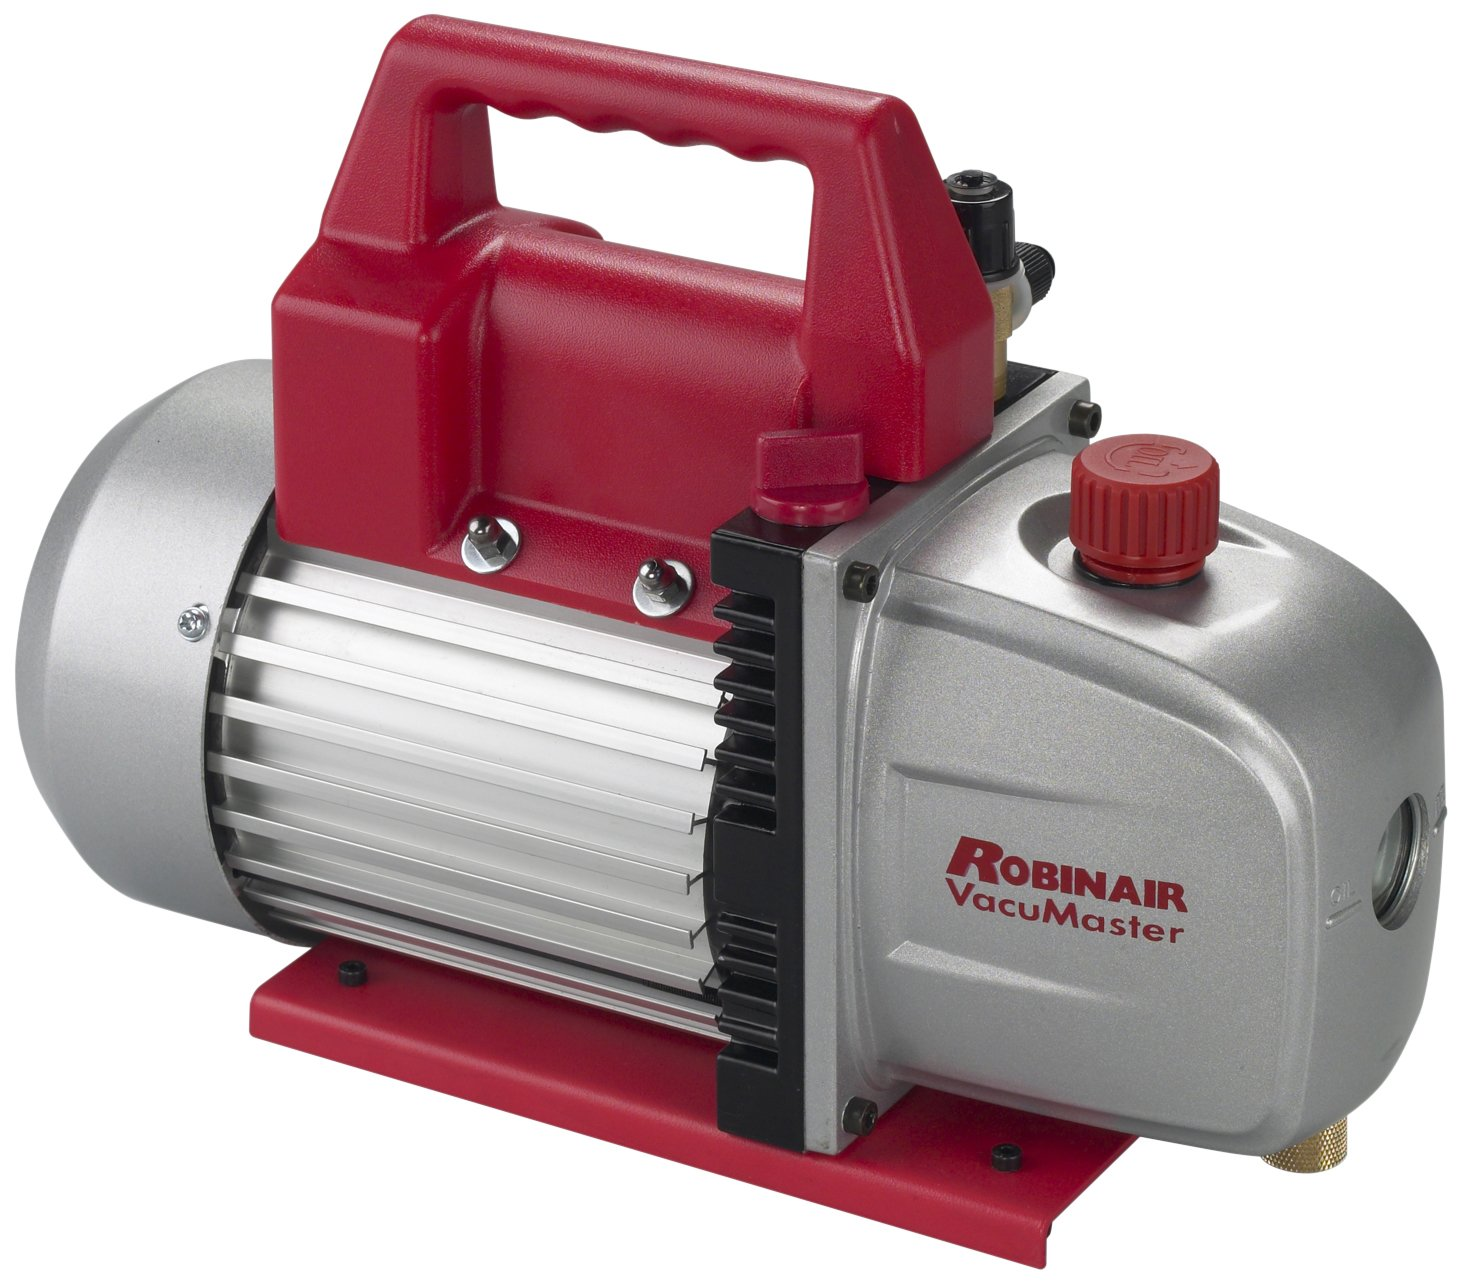 Amazon Robinair 15500 VacuMaster Economy Vacuum Pump